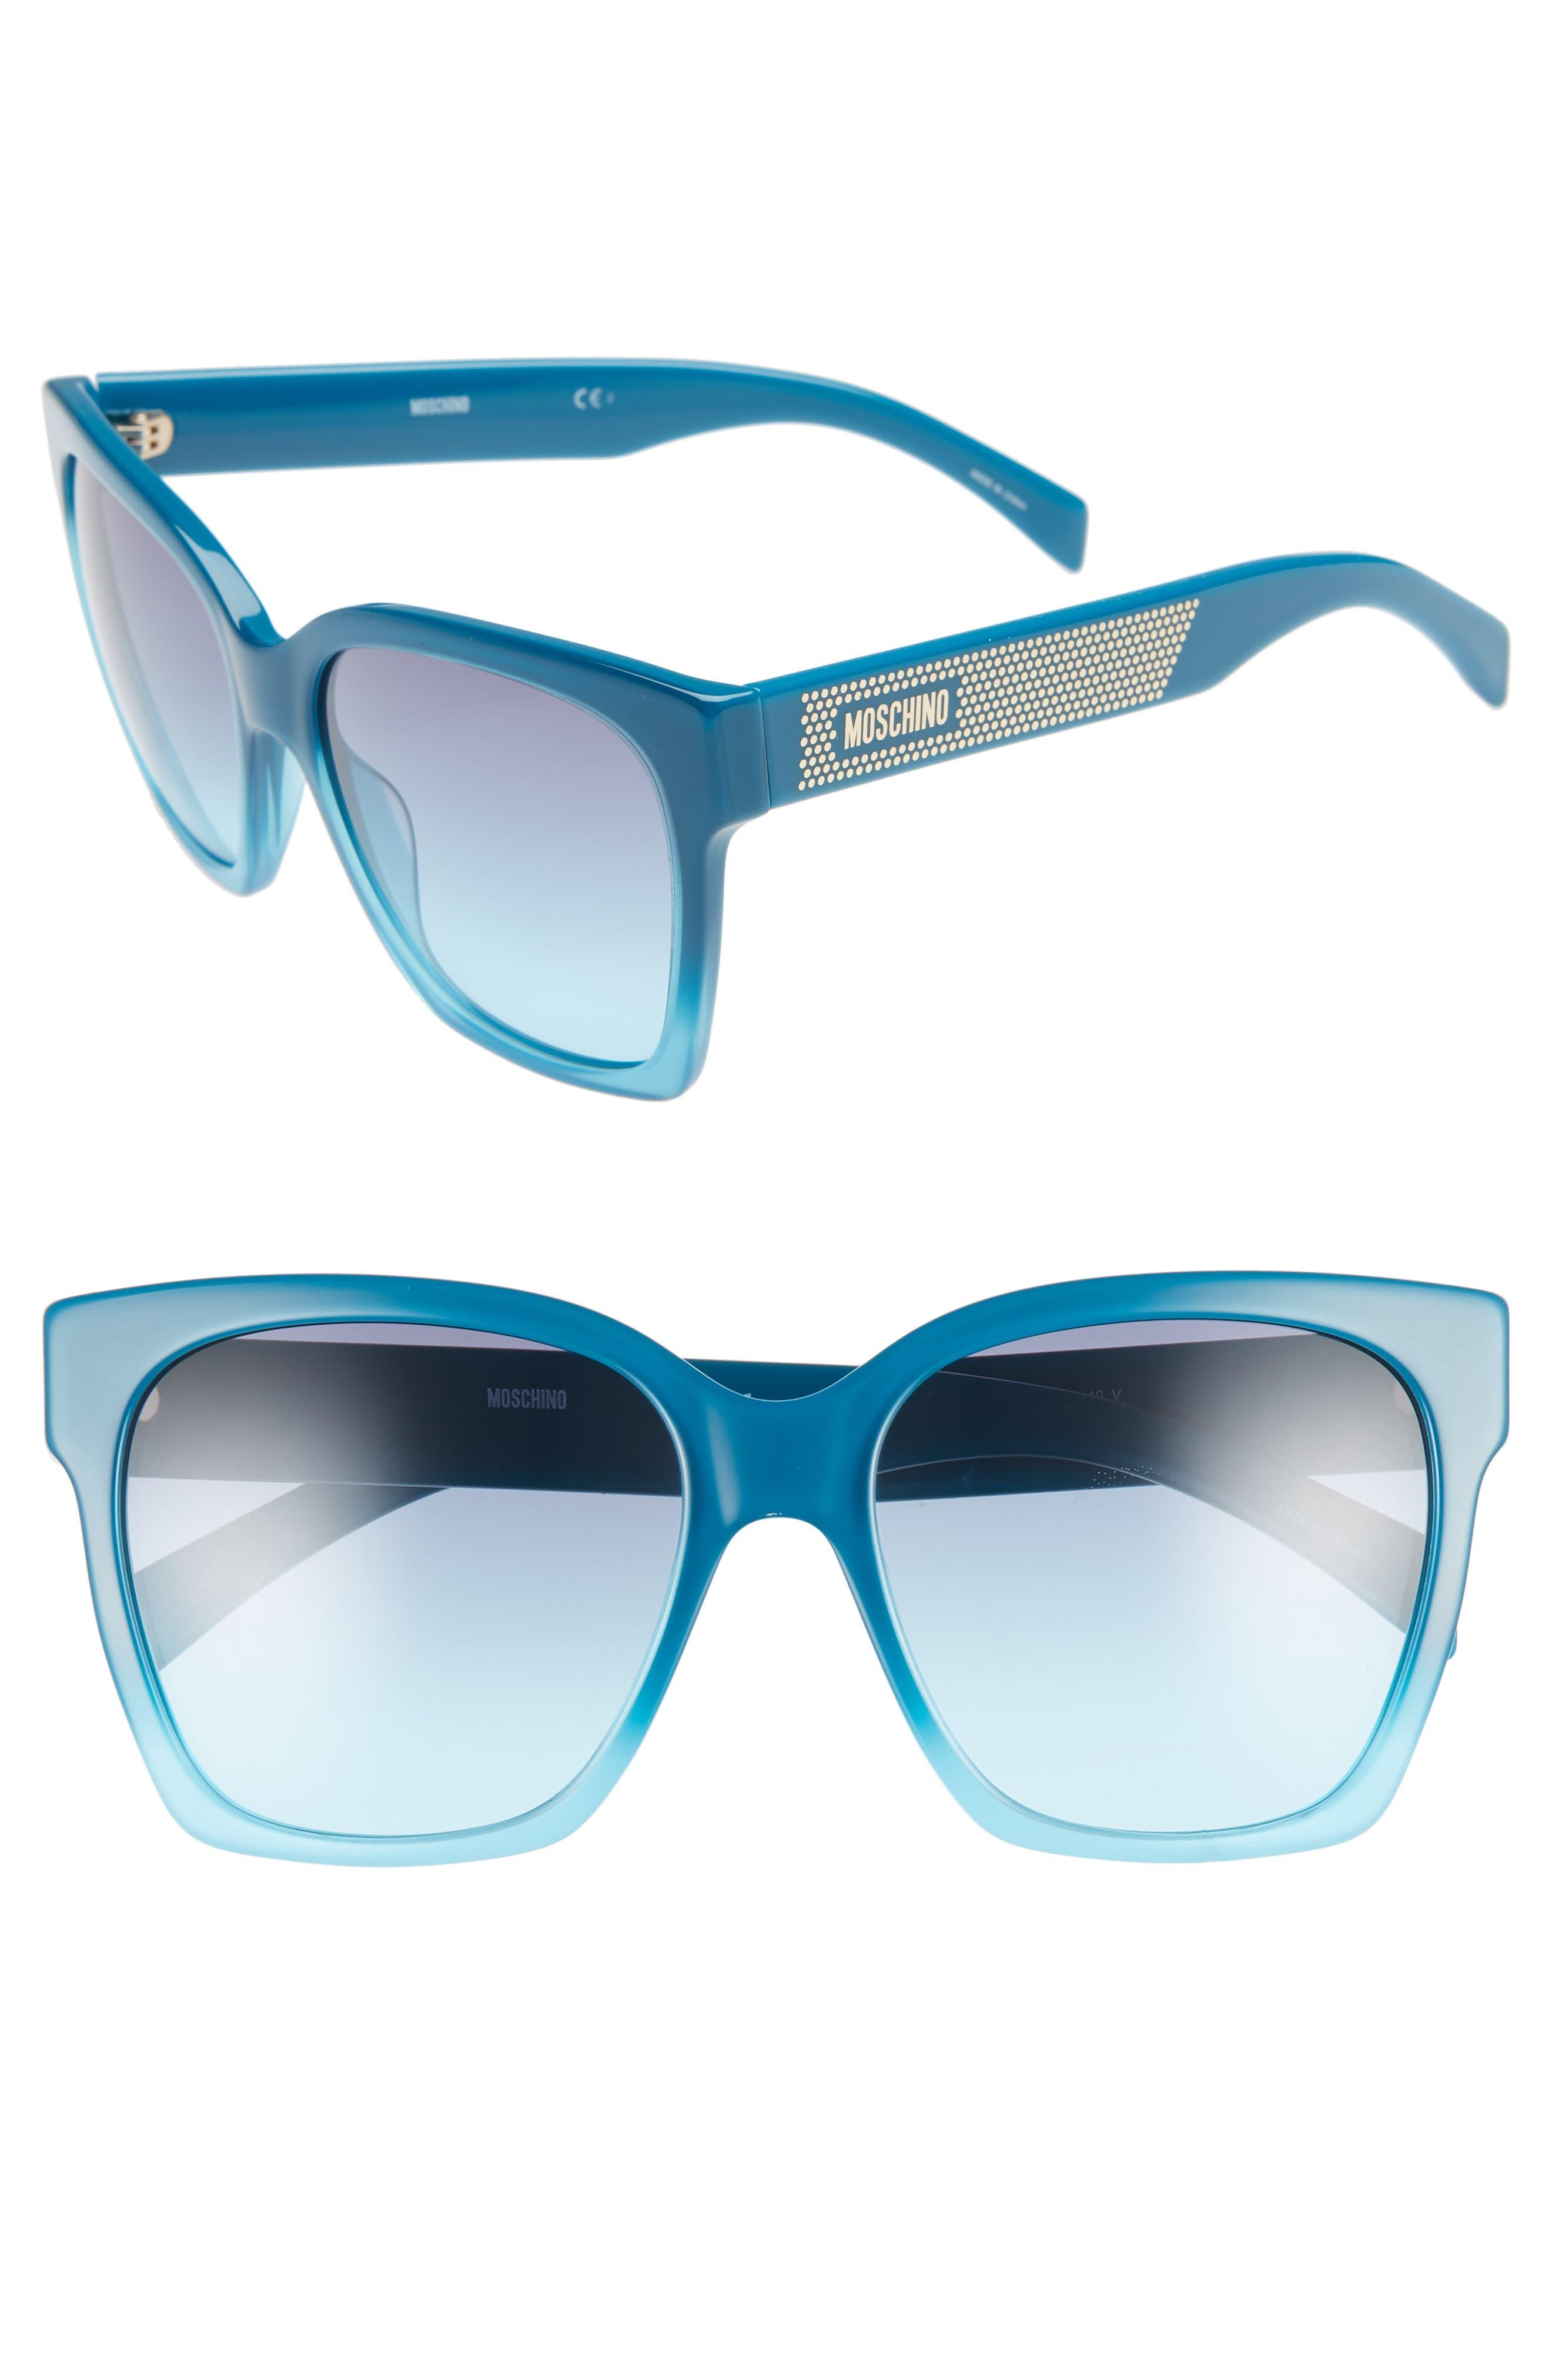 MOSCHINO, 56mm Sunglasses, Main thumbnail 1, color, TEAL TEA